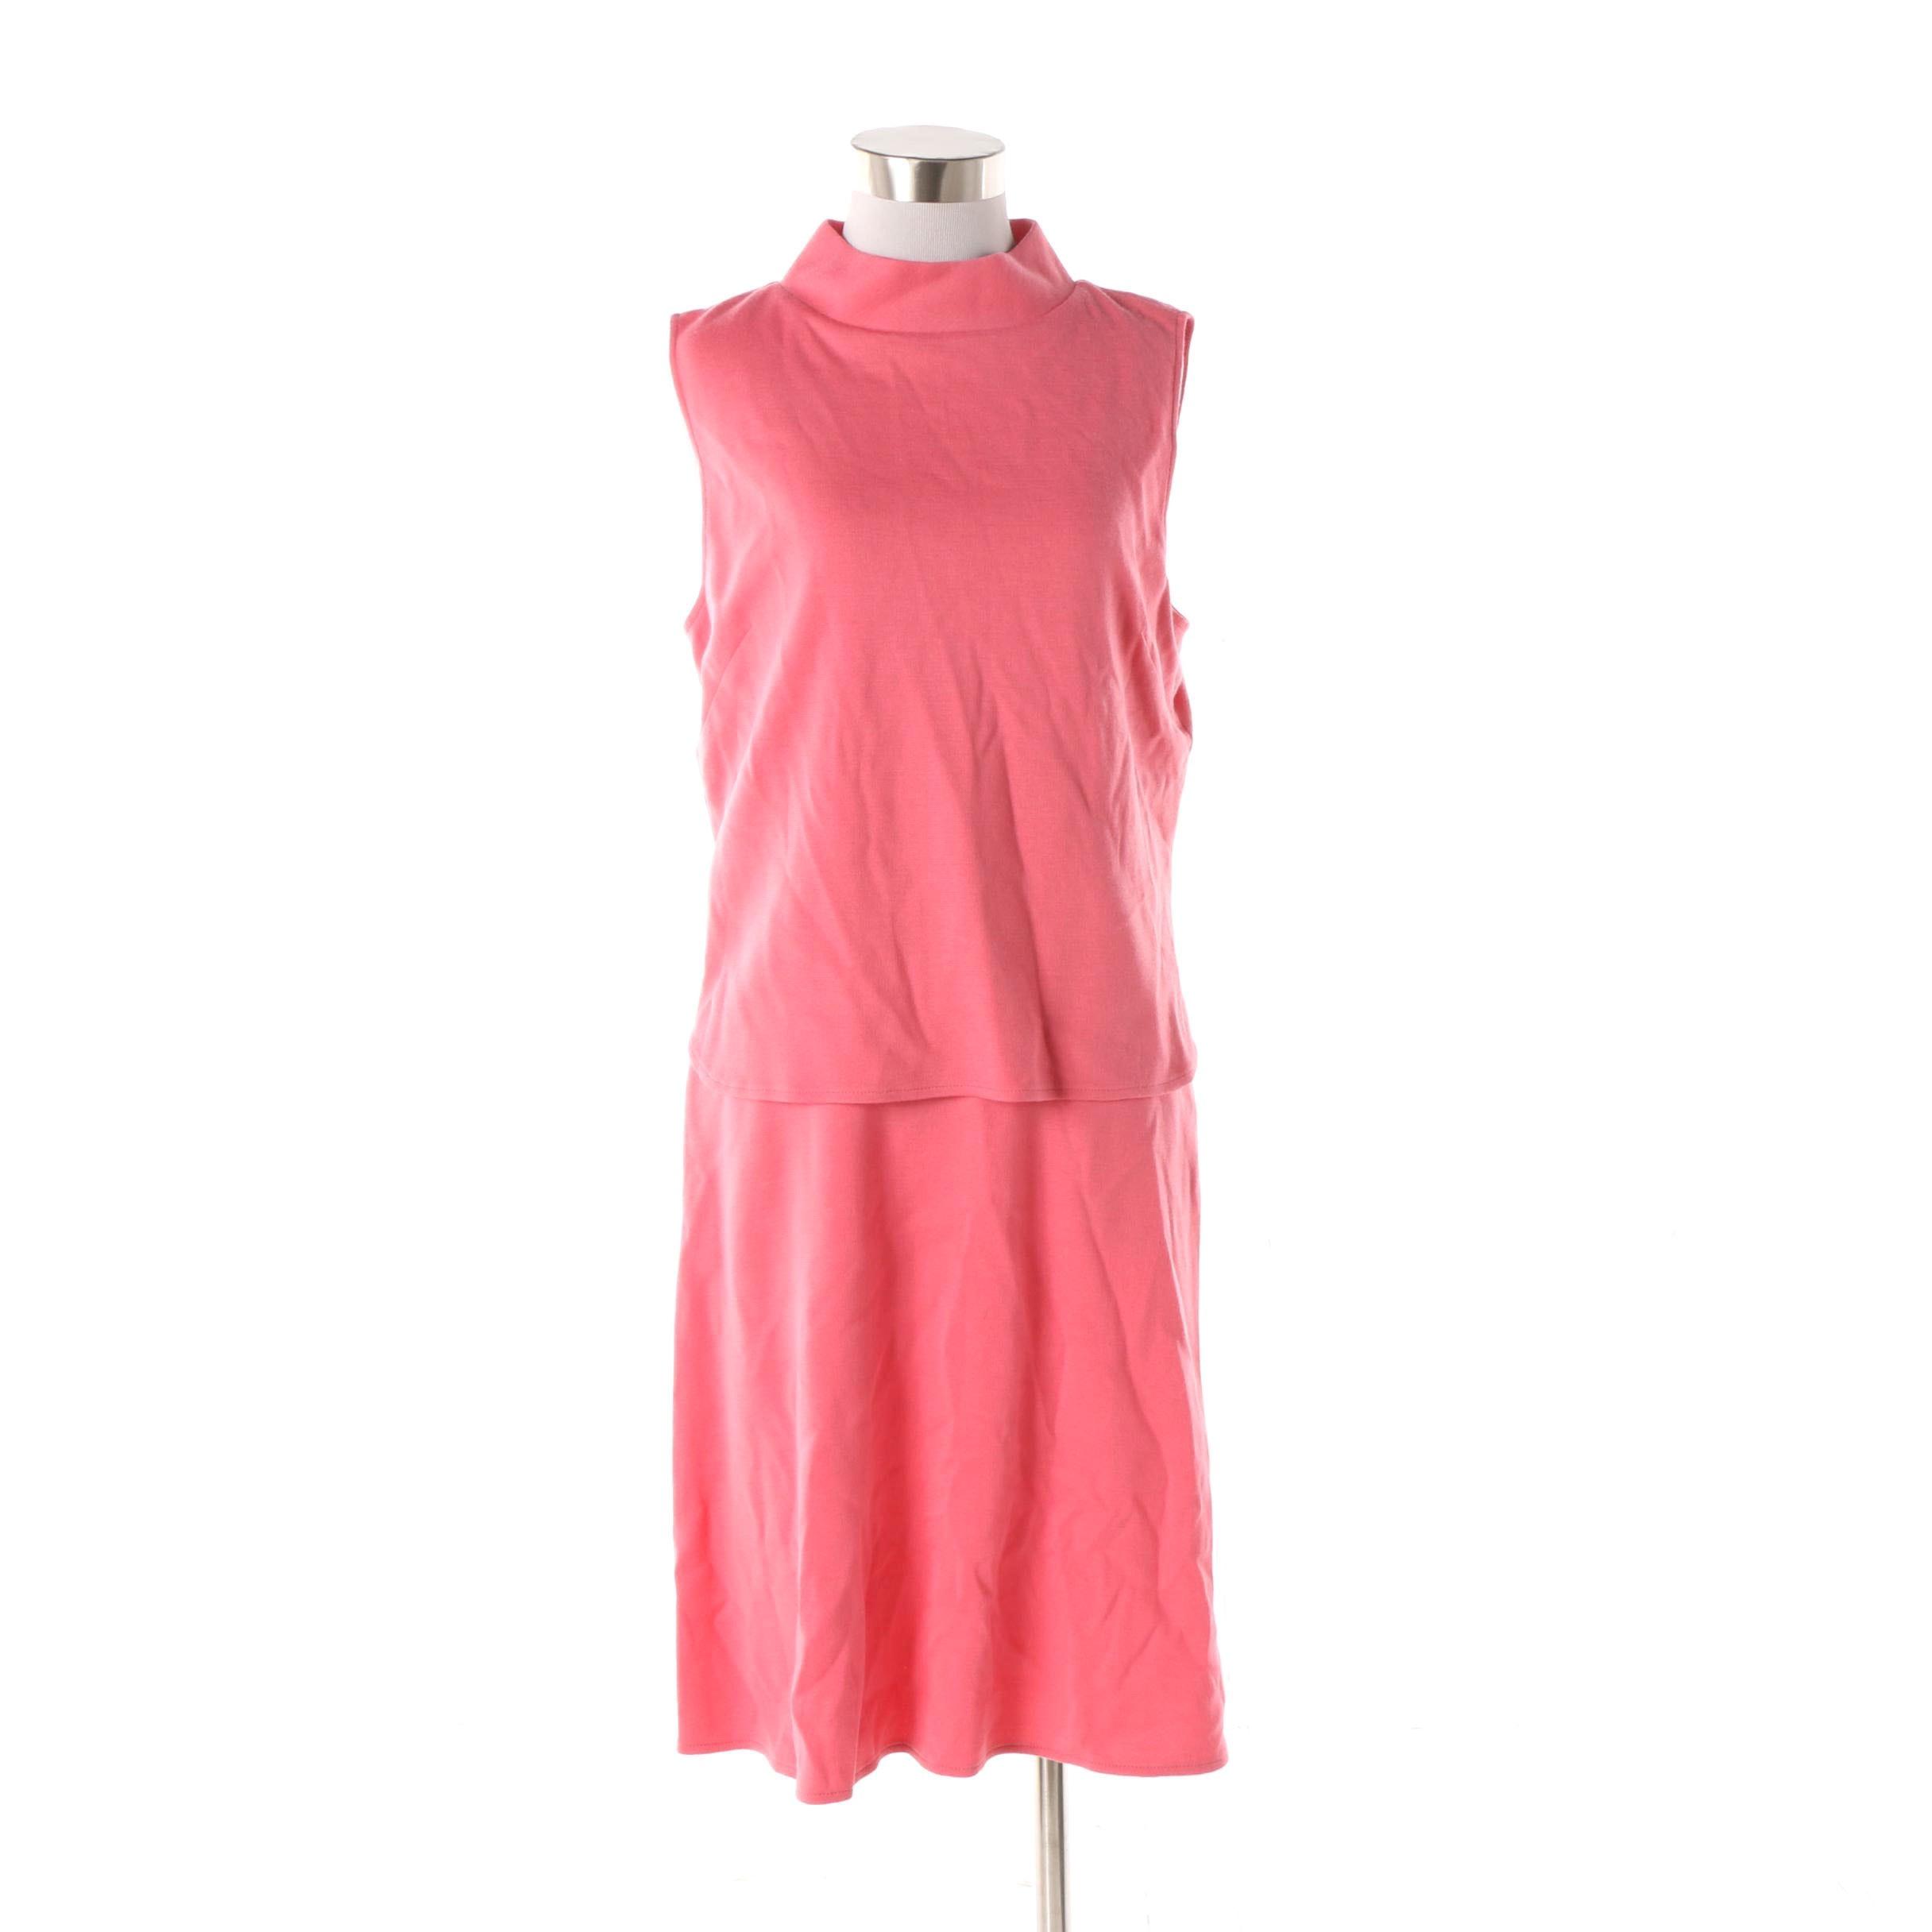 St. John Coral Pink Overlay Bodice Sleeveless Dress